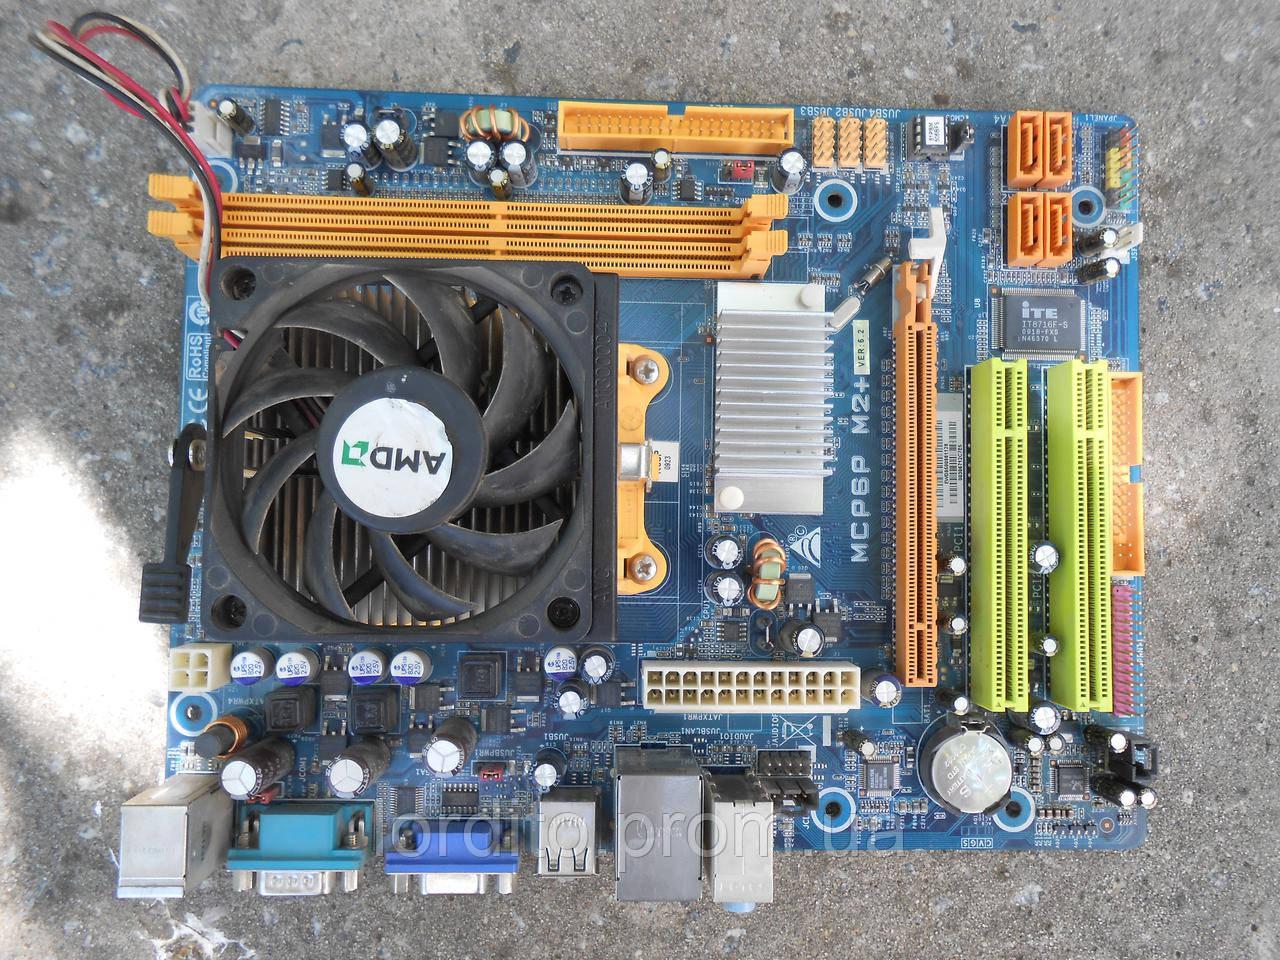 BIOSTAR MCP6P M2+ VER 6.2 WINDOWS 7 X64 TREIBER